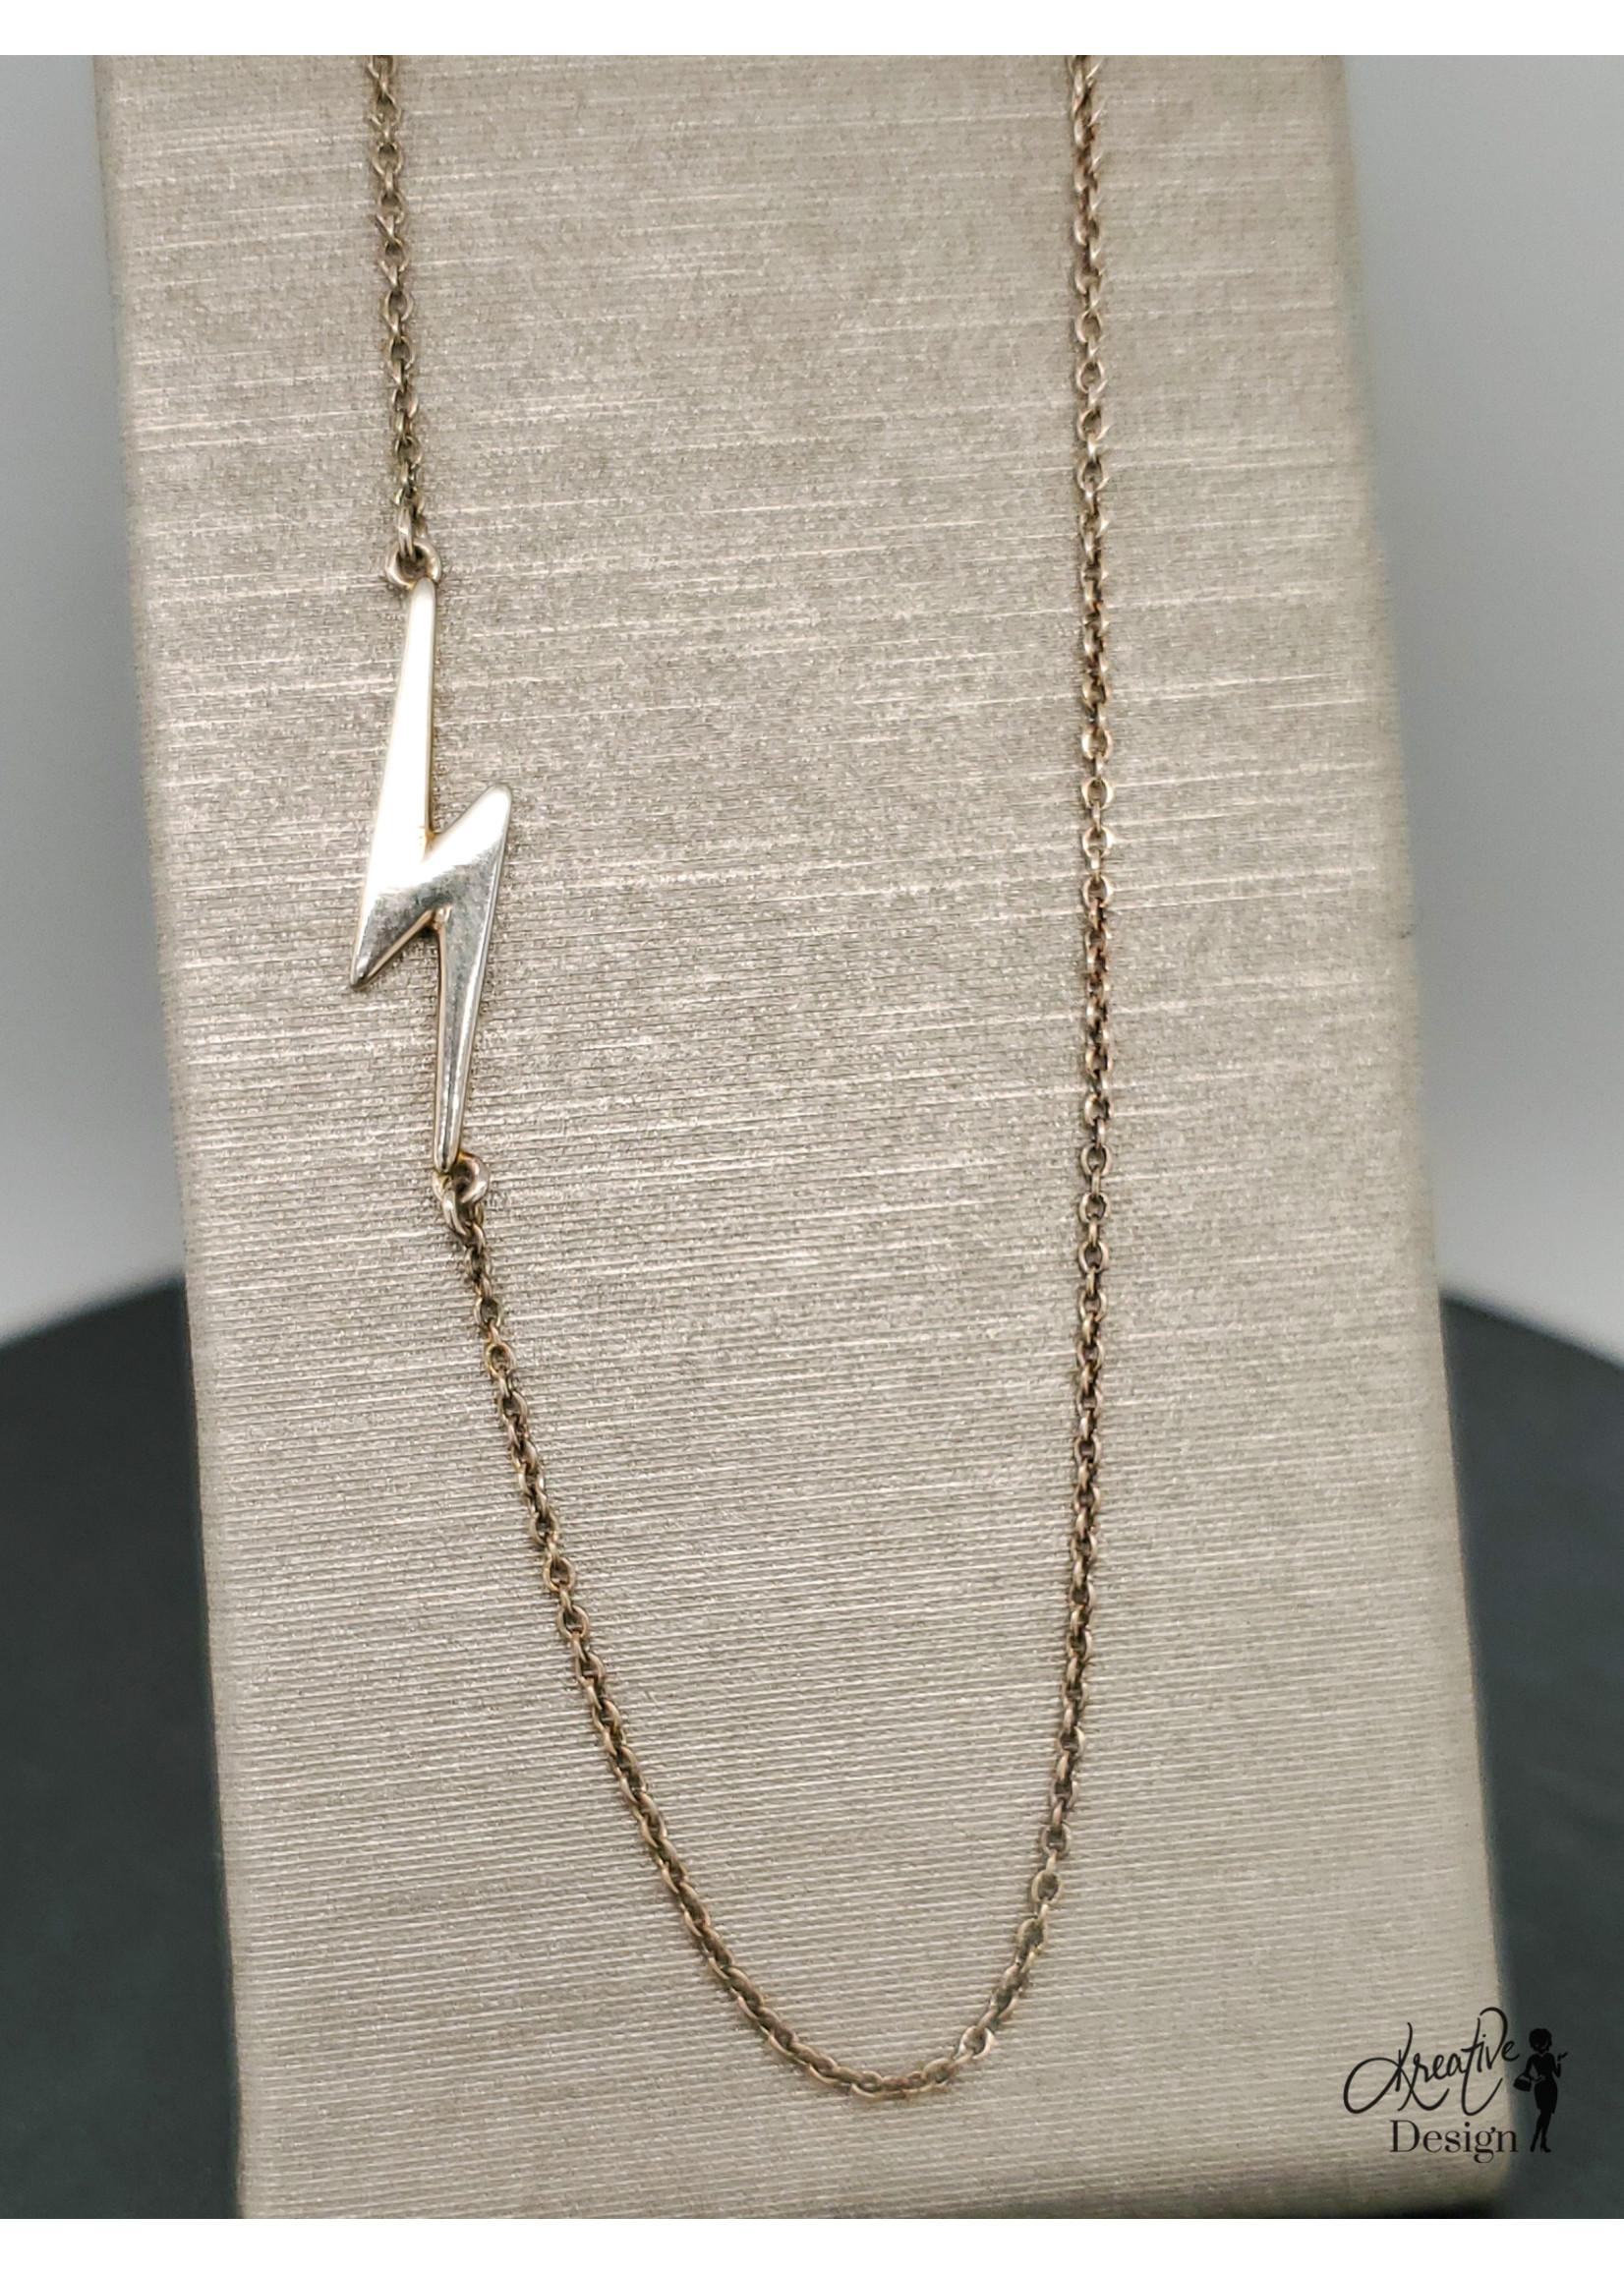 KDesign Regal Collection Regal Asymmetrical Lightning Necklace